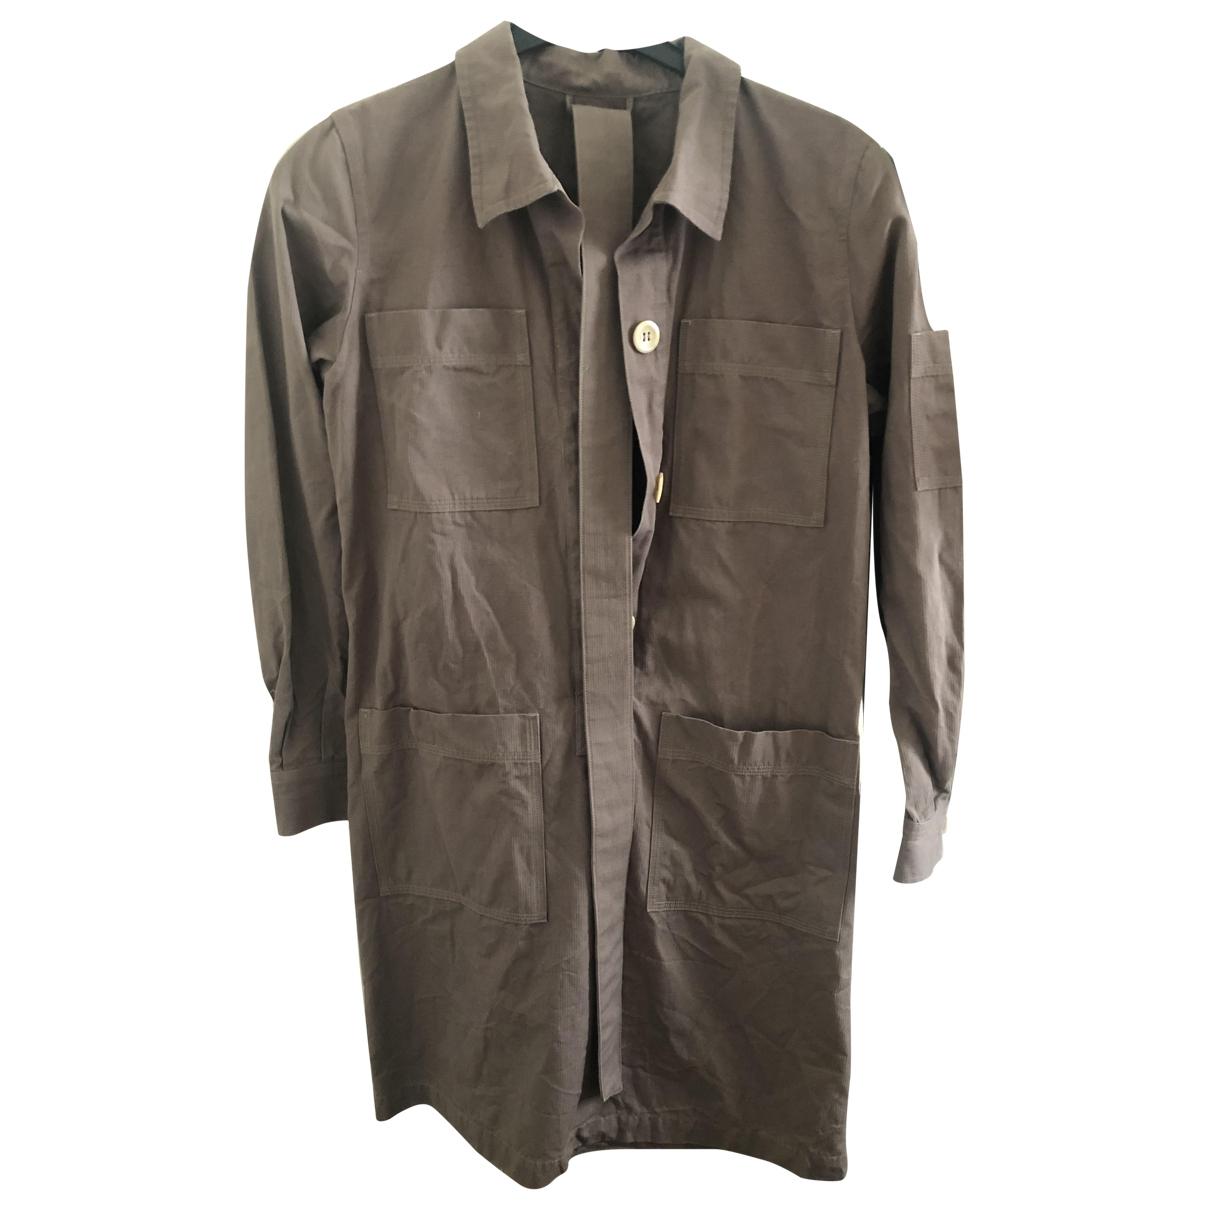 Apc - Robe   pour femme en coton - marron